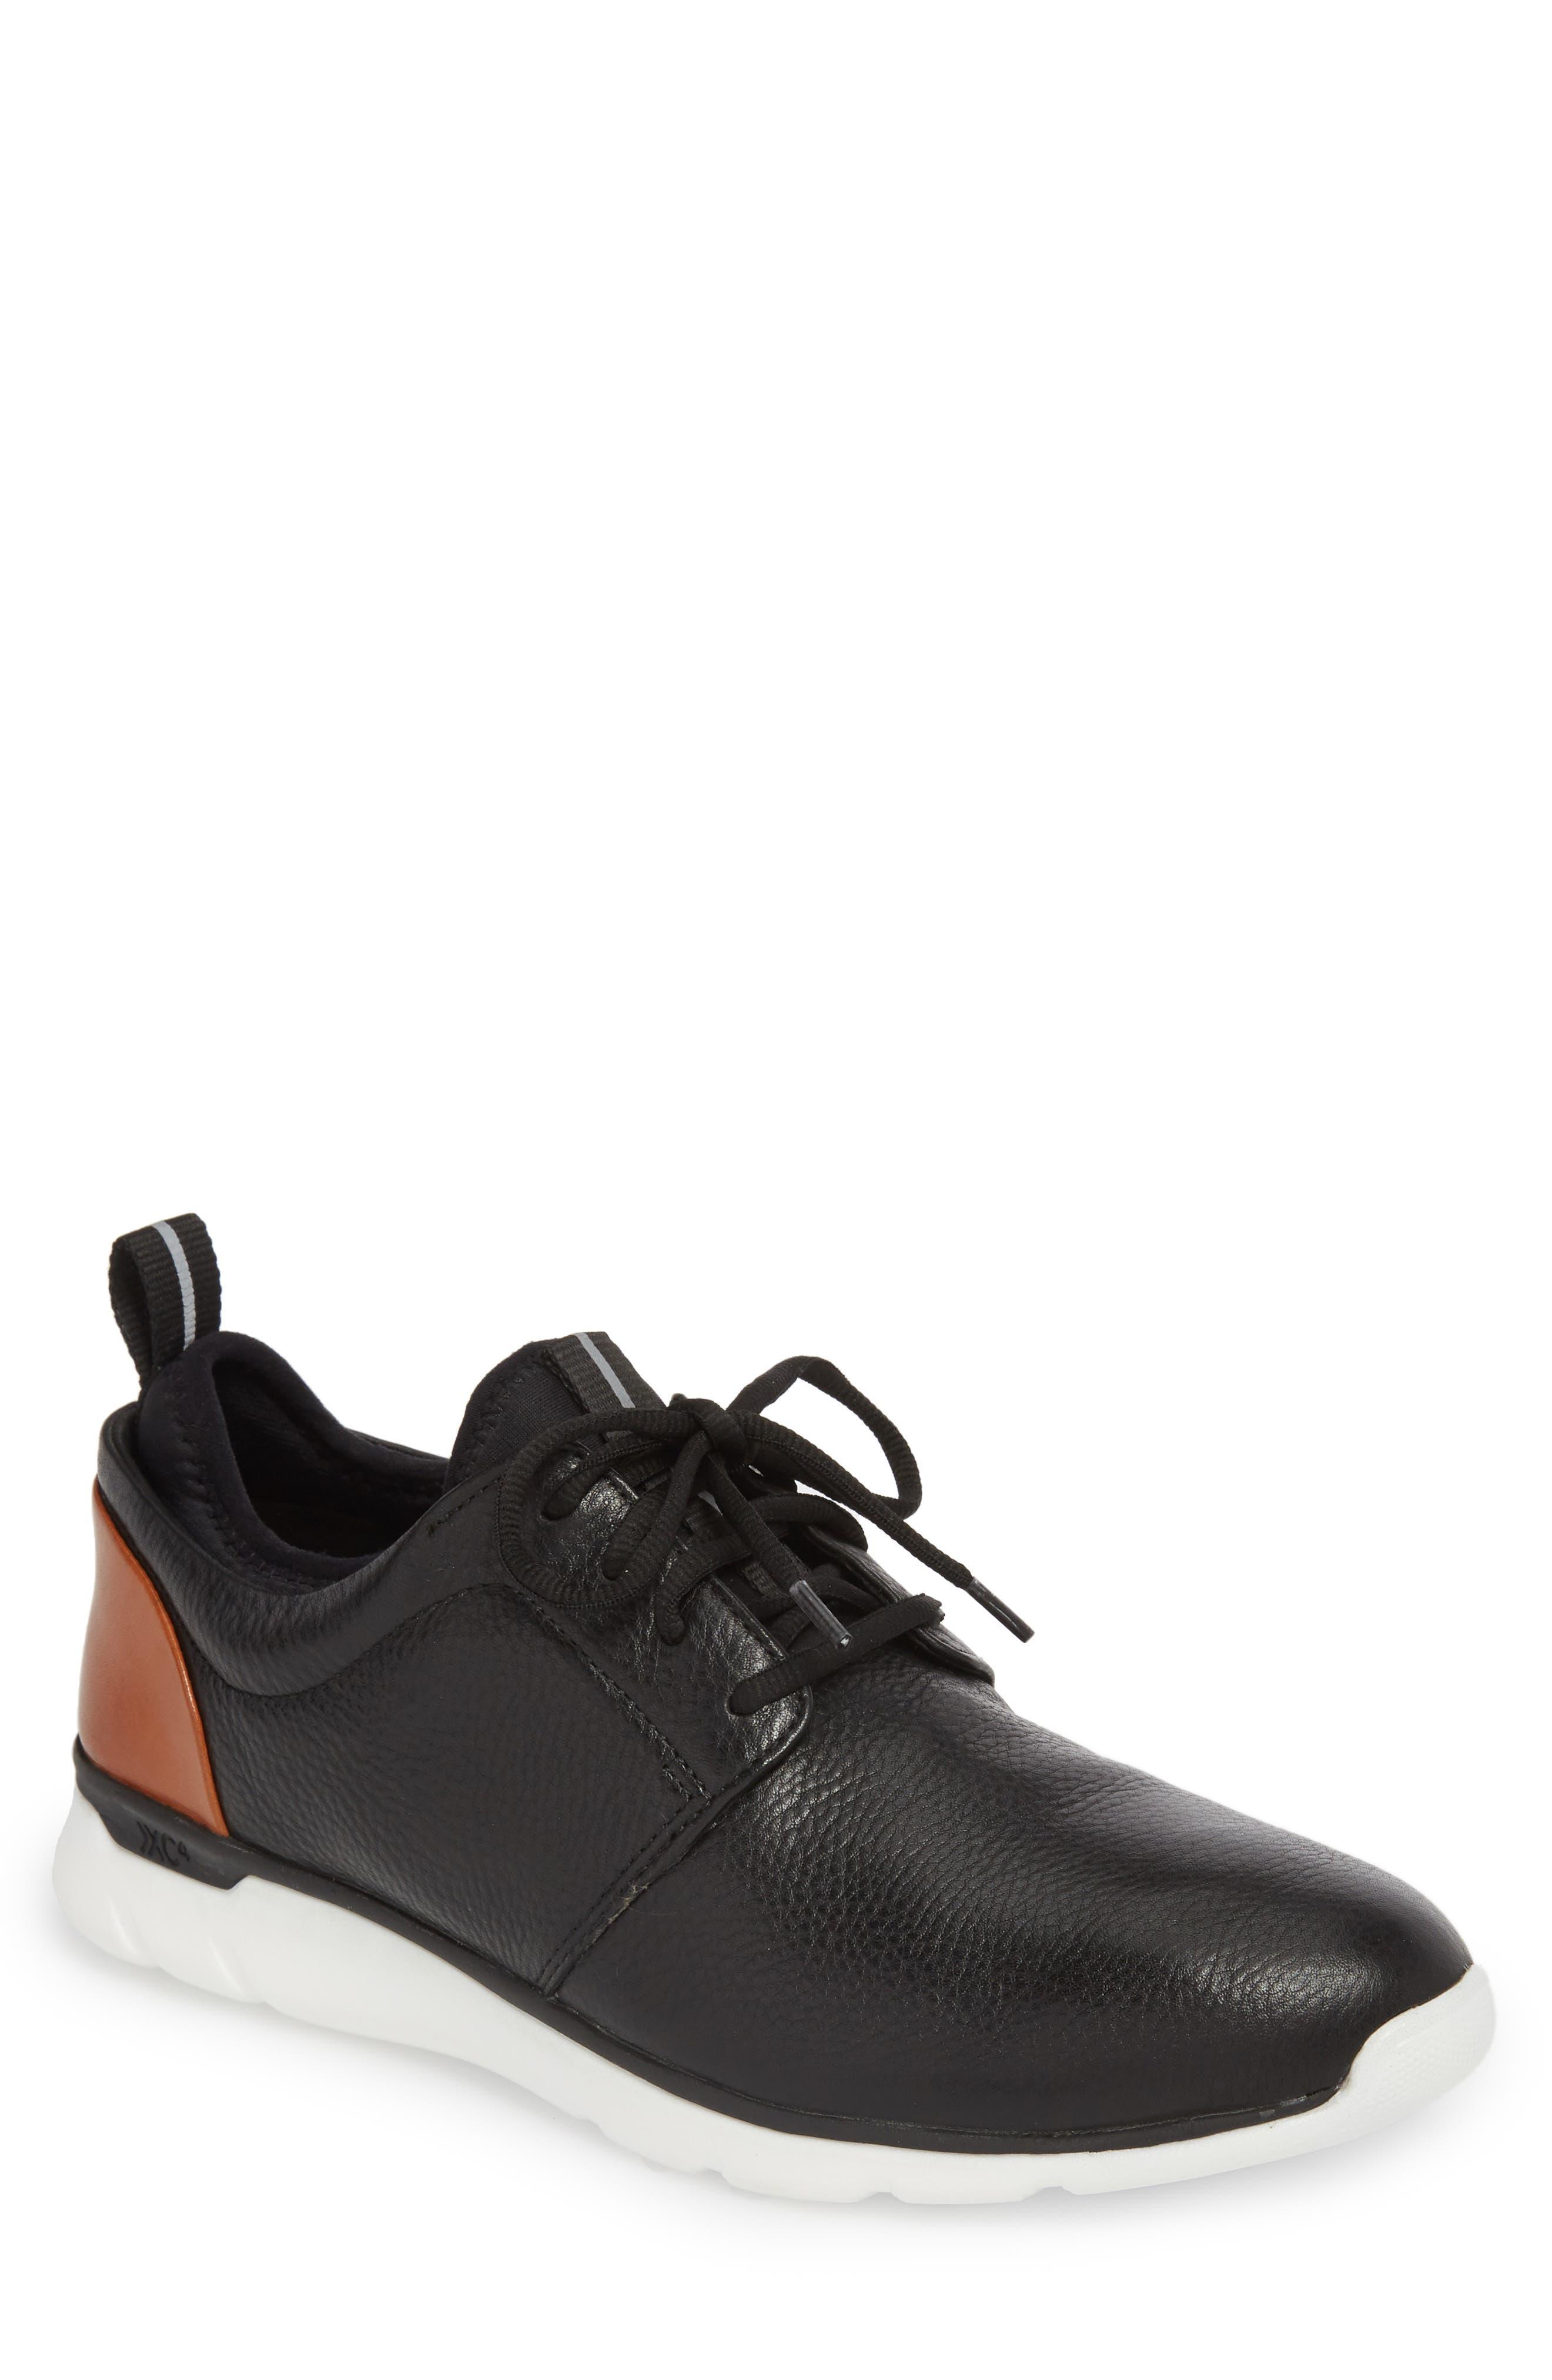 Main Image - Johnston & Murphy Prentiss XC4® Waterproof Low Top Sneaker (Men)